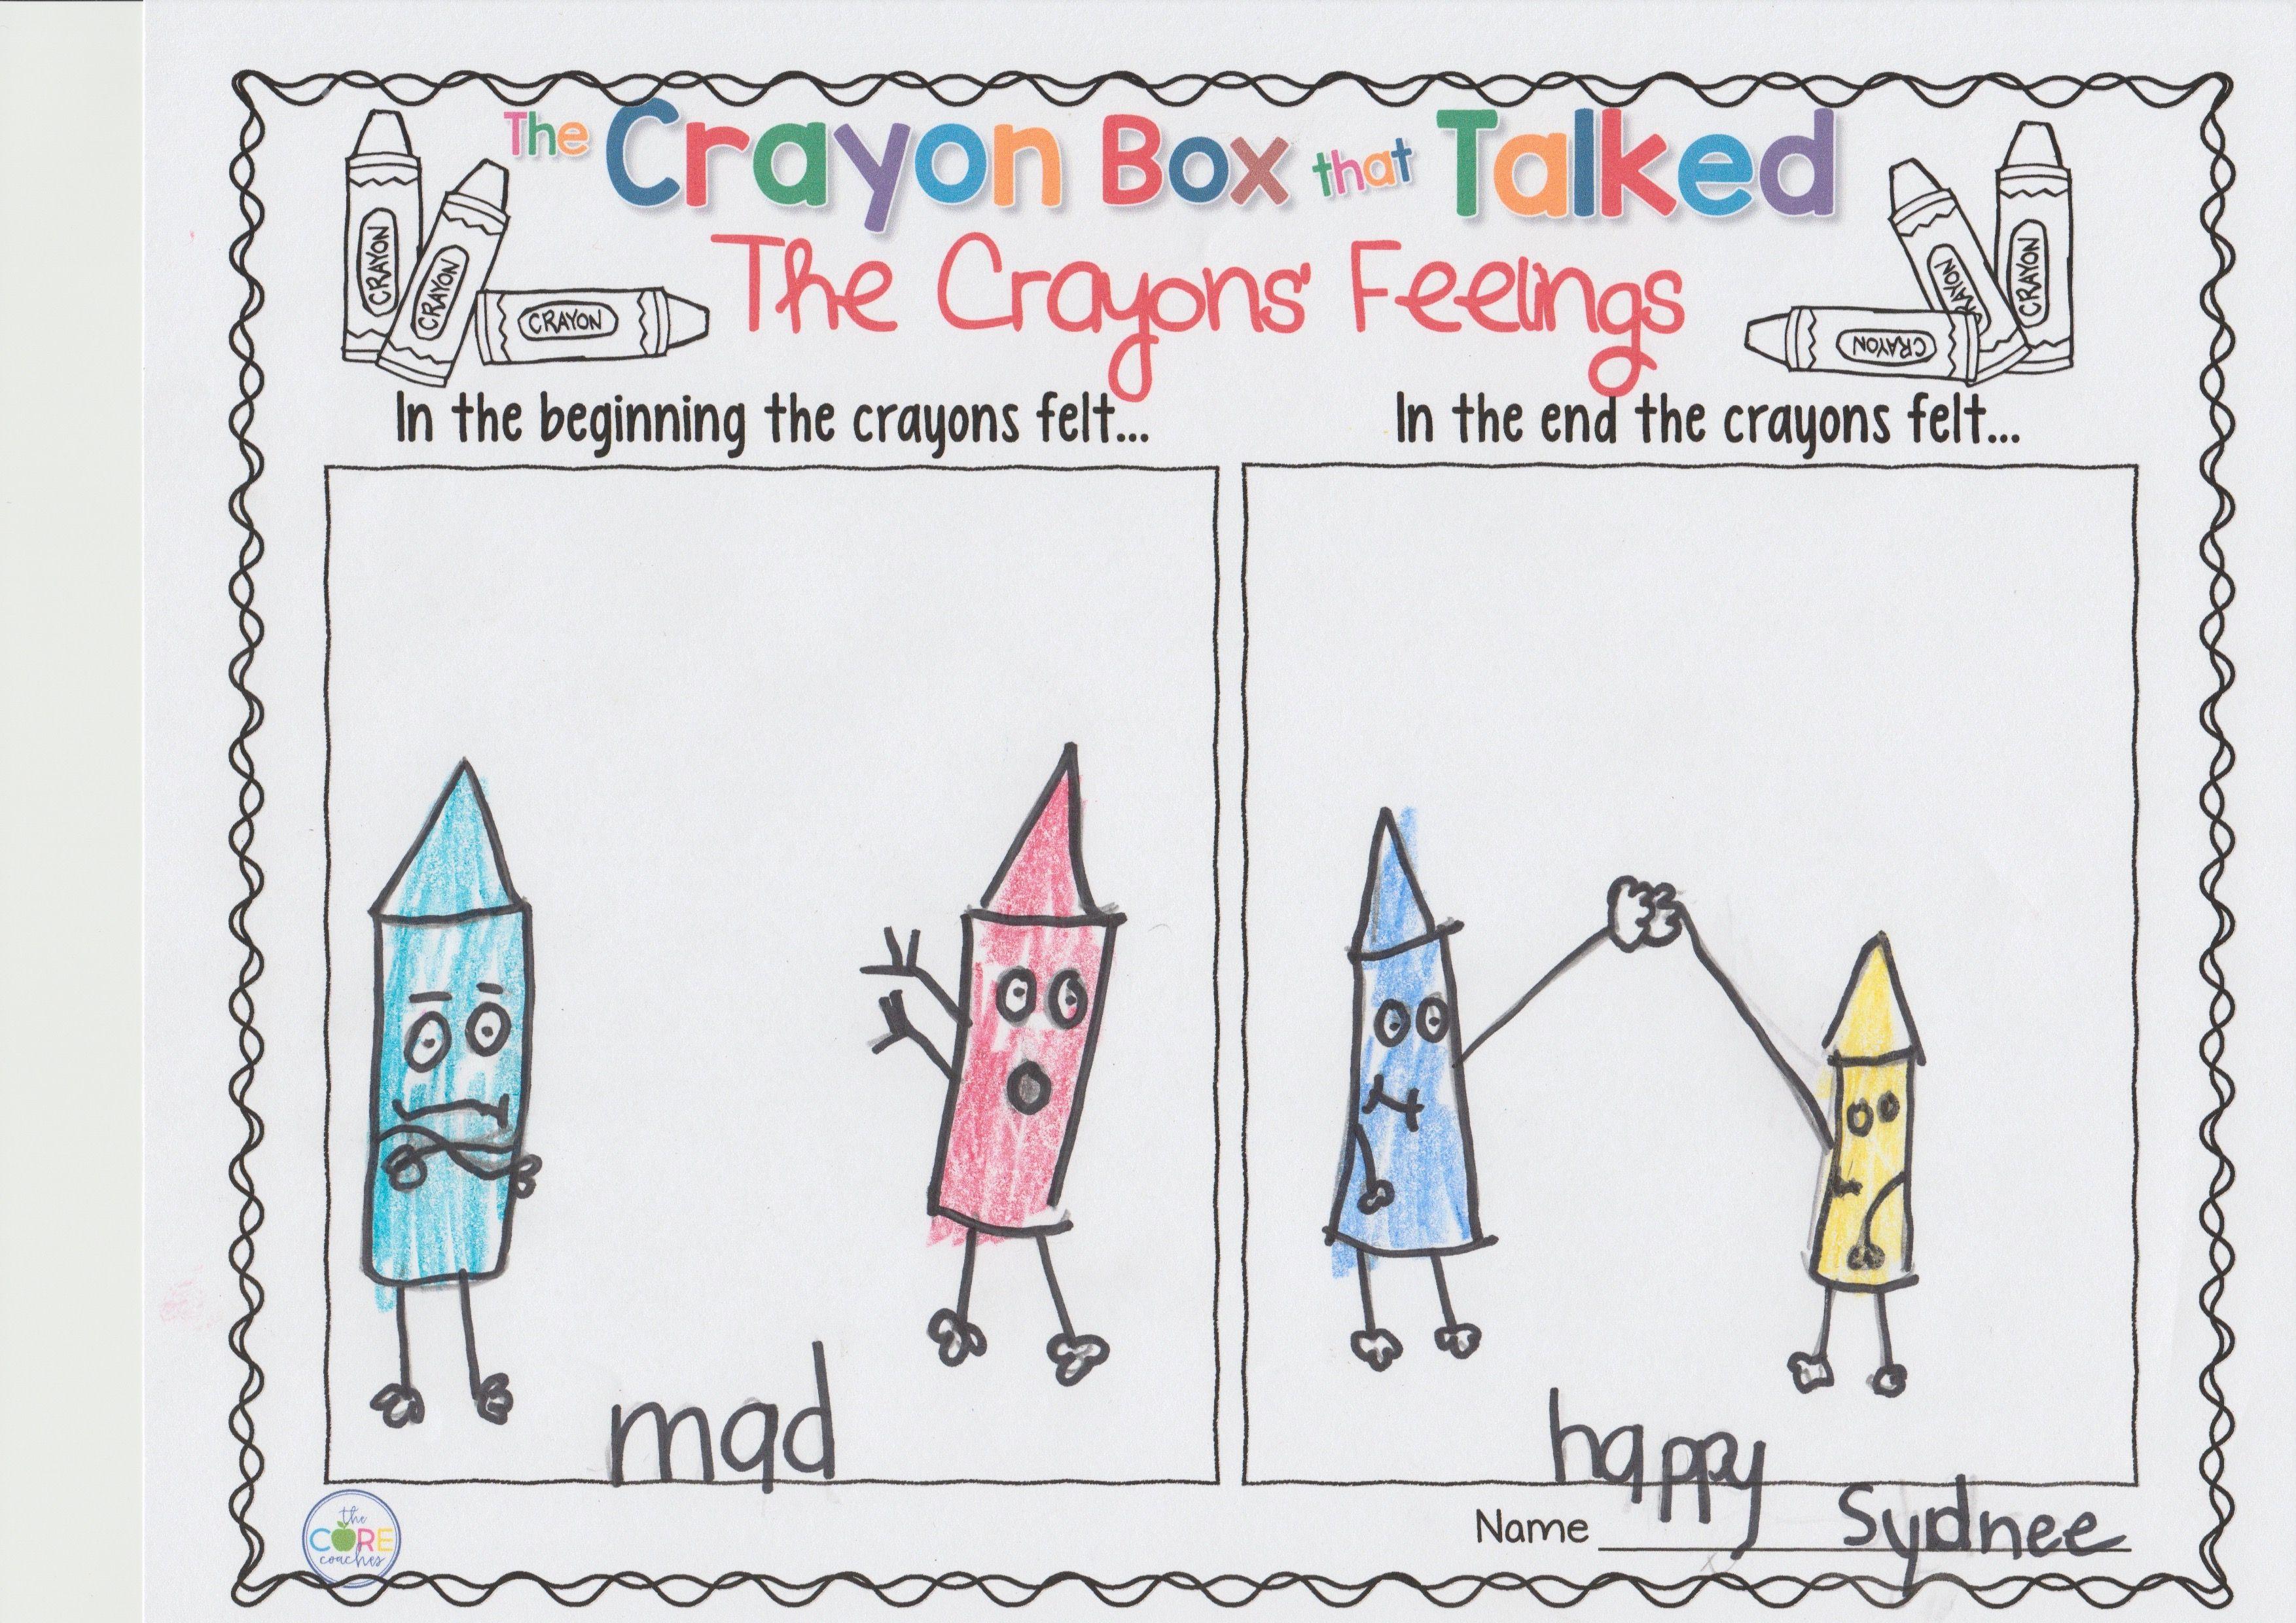 The Crayon Box That Talked Digital Read Aloud